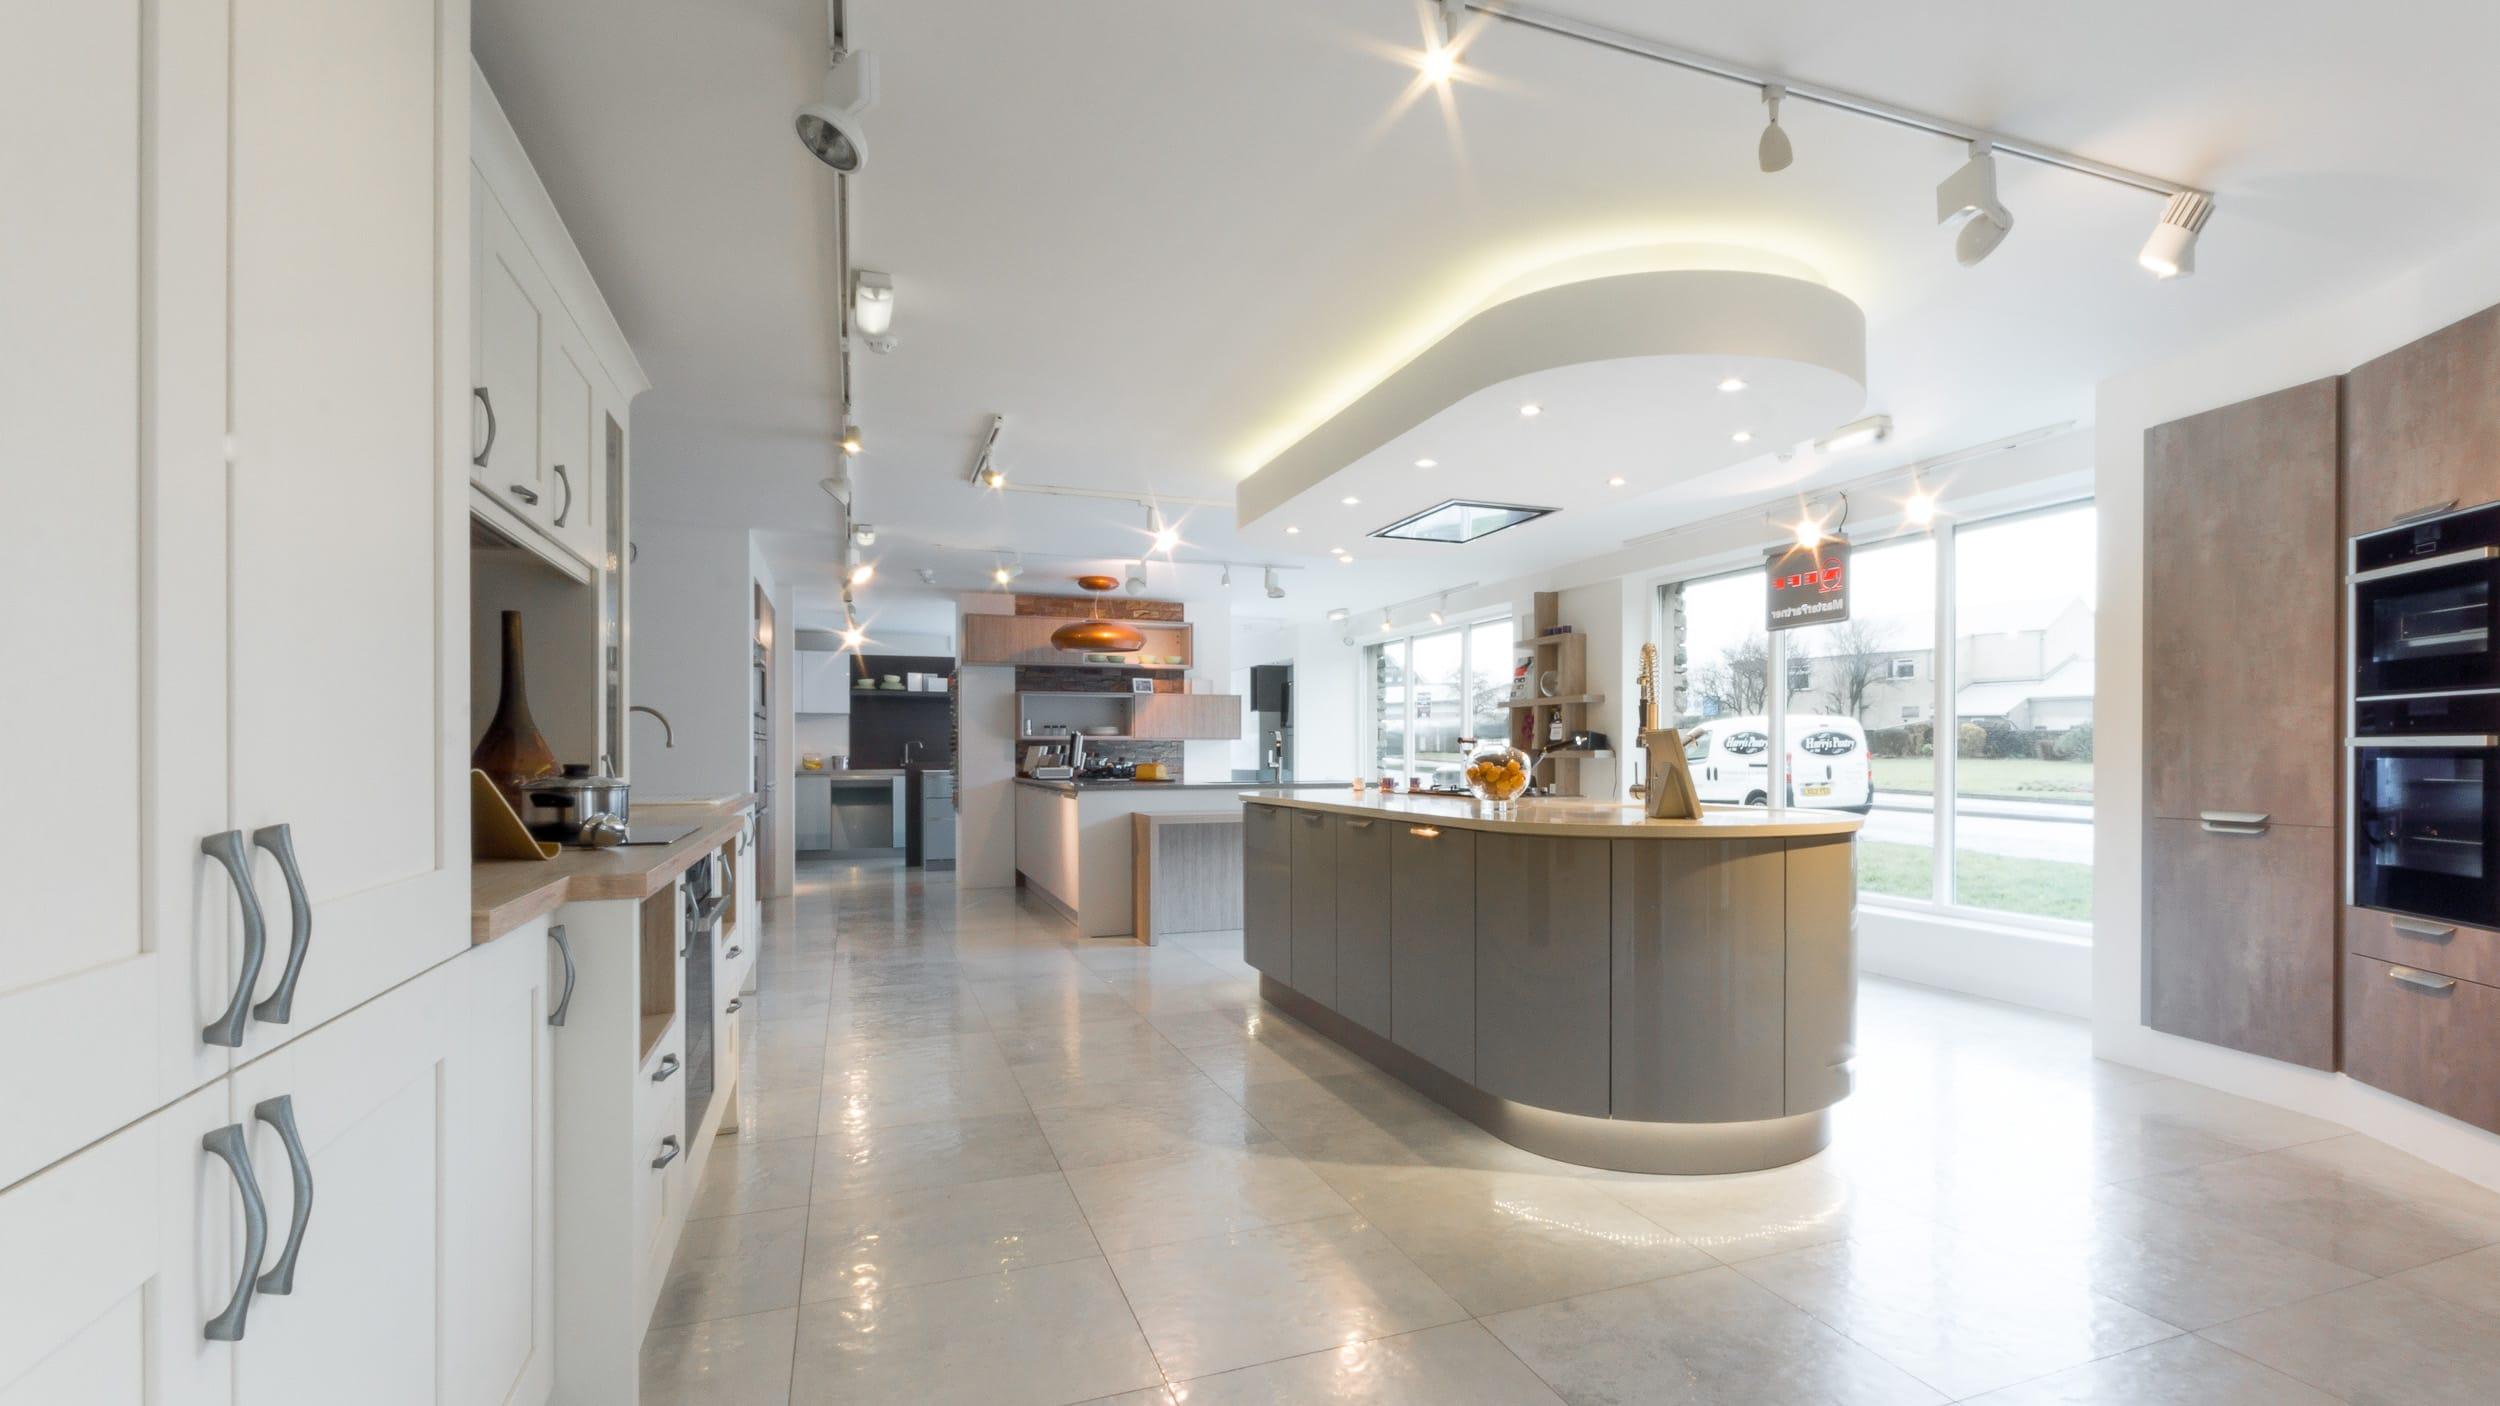 Kitchen-Showroom-Webbs-Kendal-31.jpg